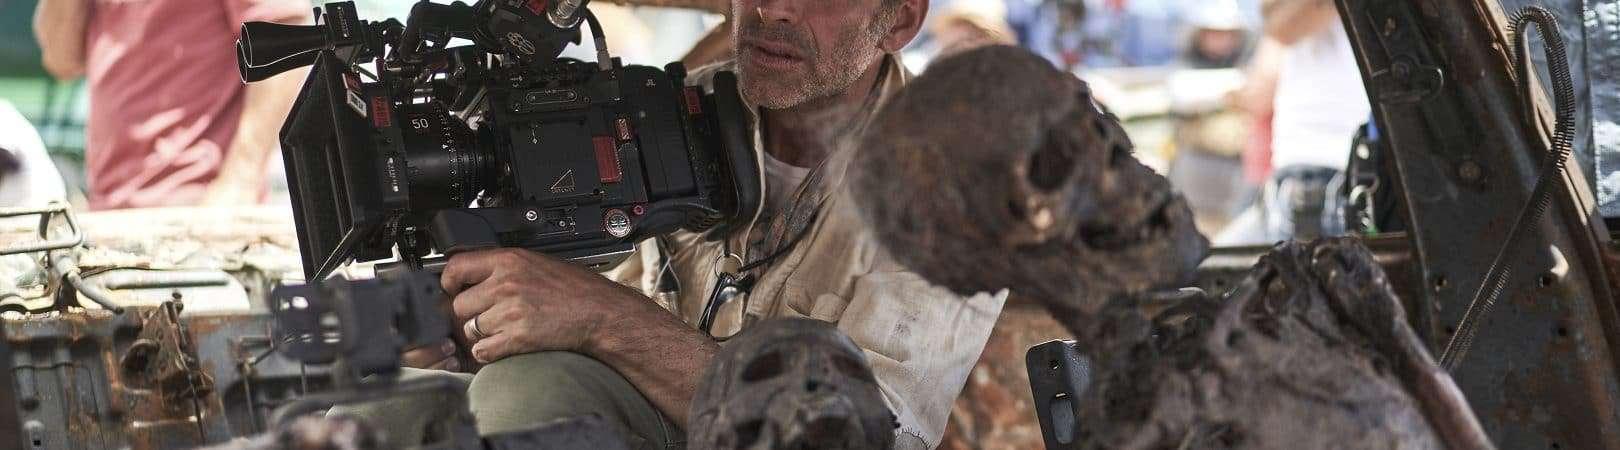 Director Zack Snyder. Image: CLAY ENOS / NETFLIX © 2021